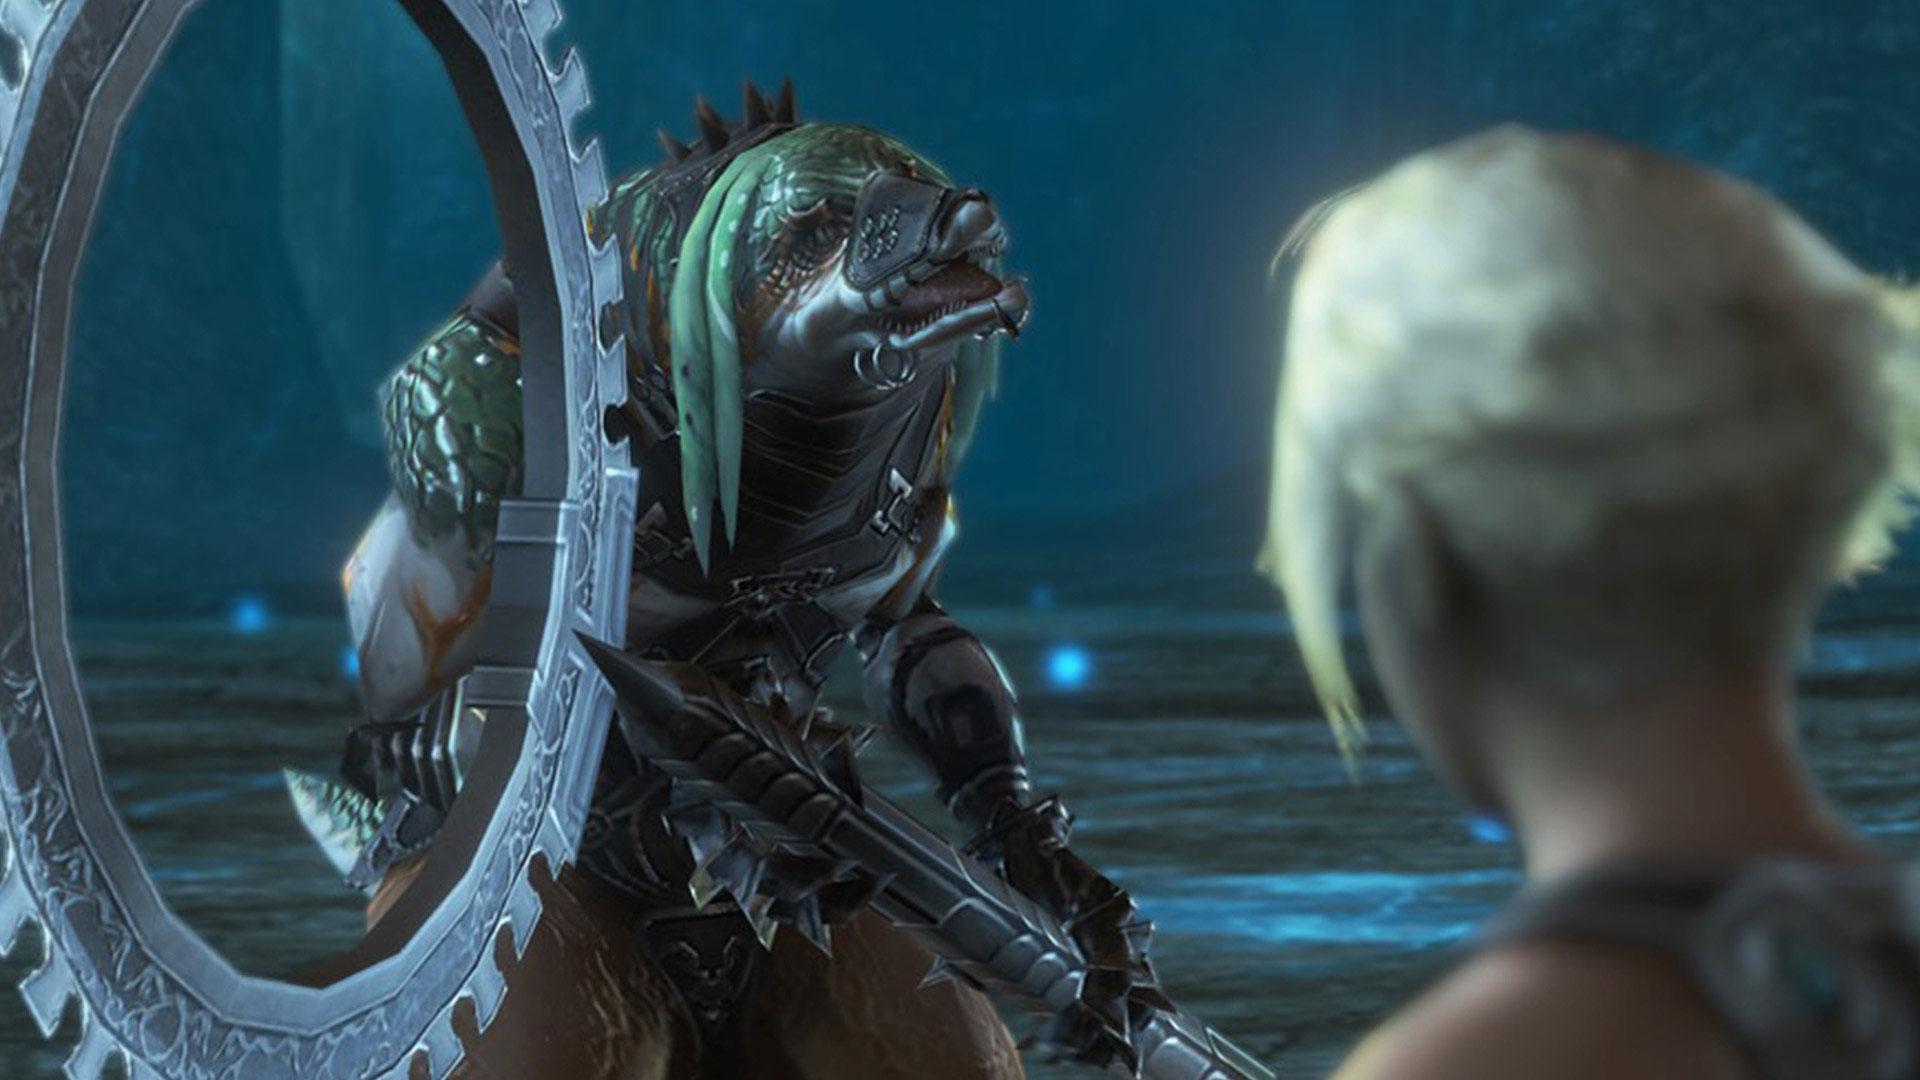 Final Fantasy XII The Zodiac Age Wallpapers in Ultra HD | 4K